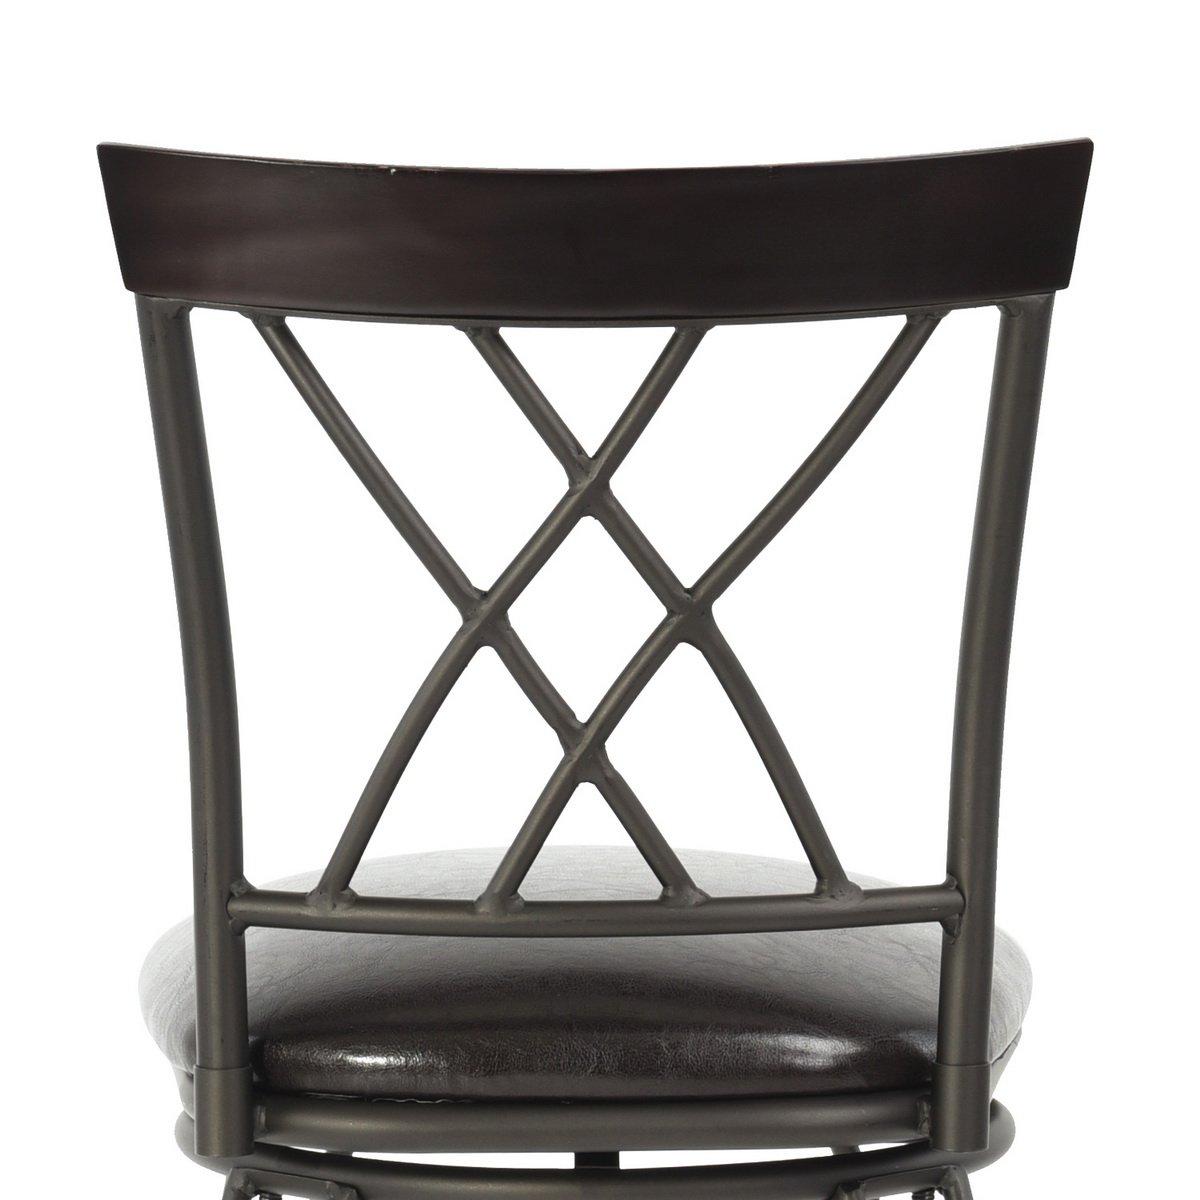 FurnitureR 24'' Circles-Back Swivel Bar stool Counter Height Bar Chair by FurnitureR (Image #7)